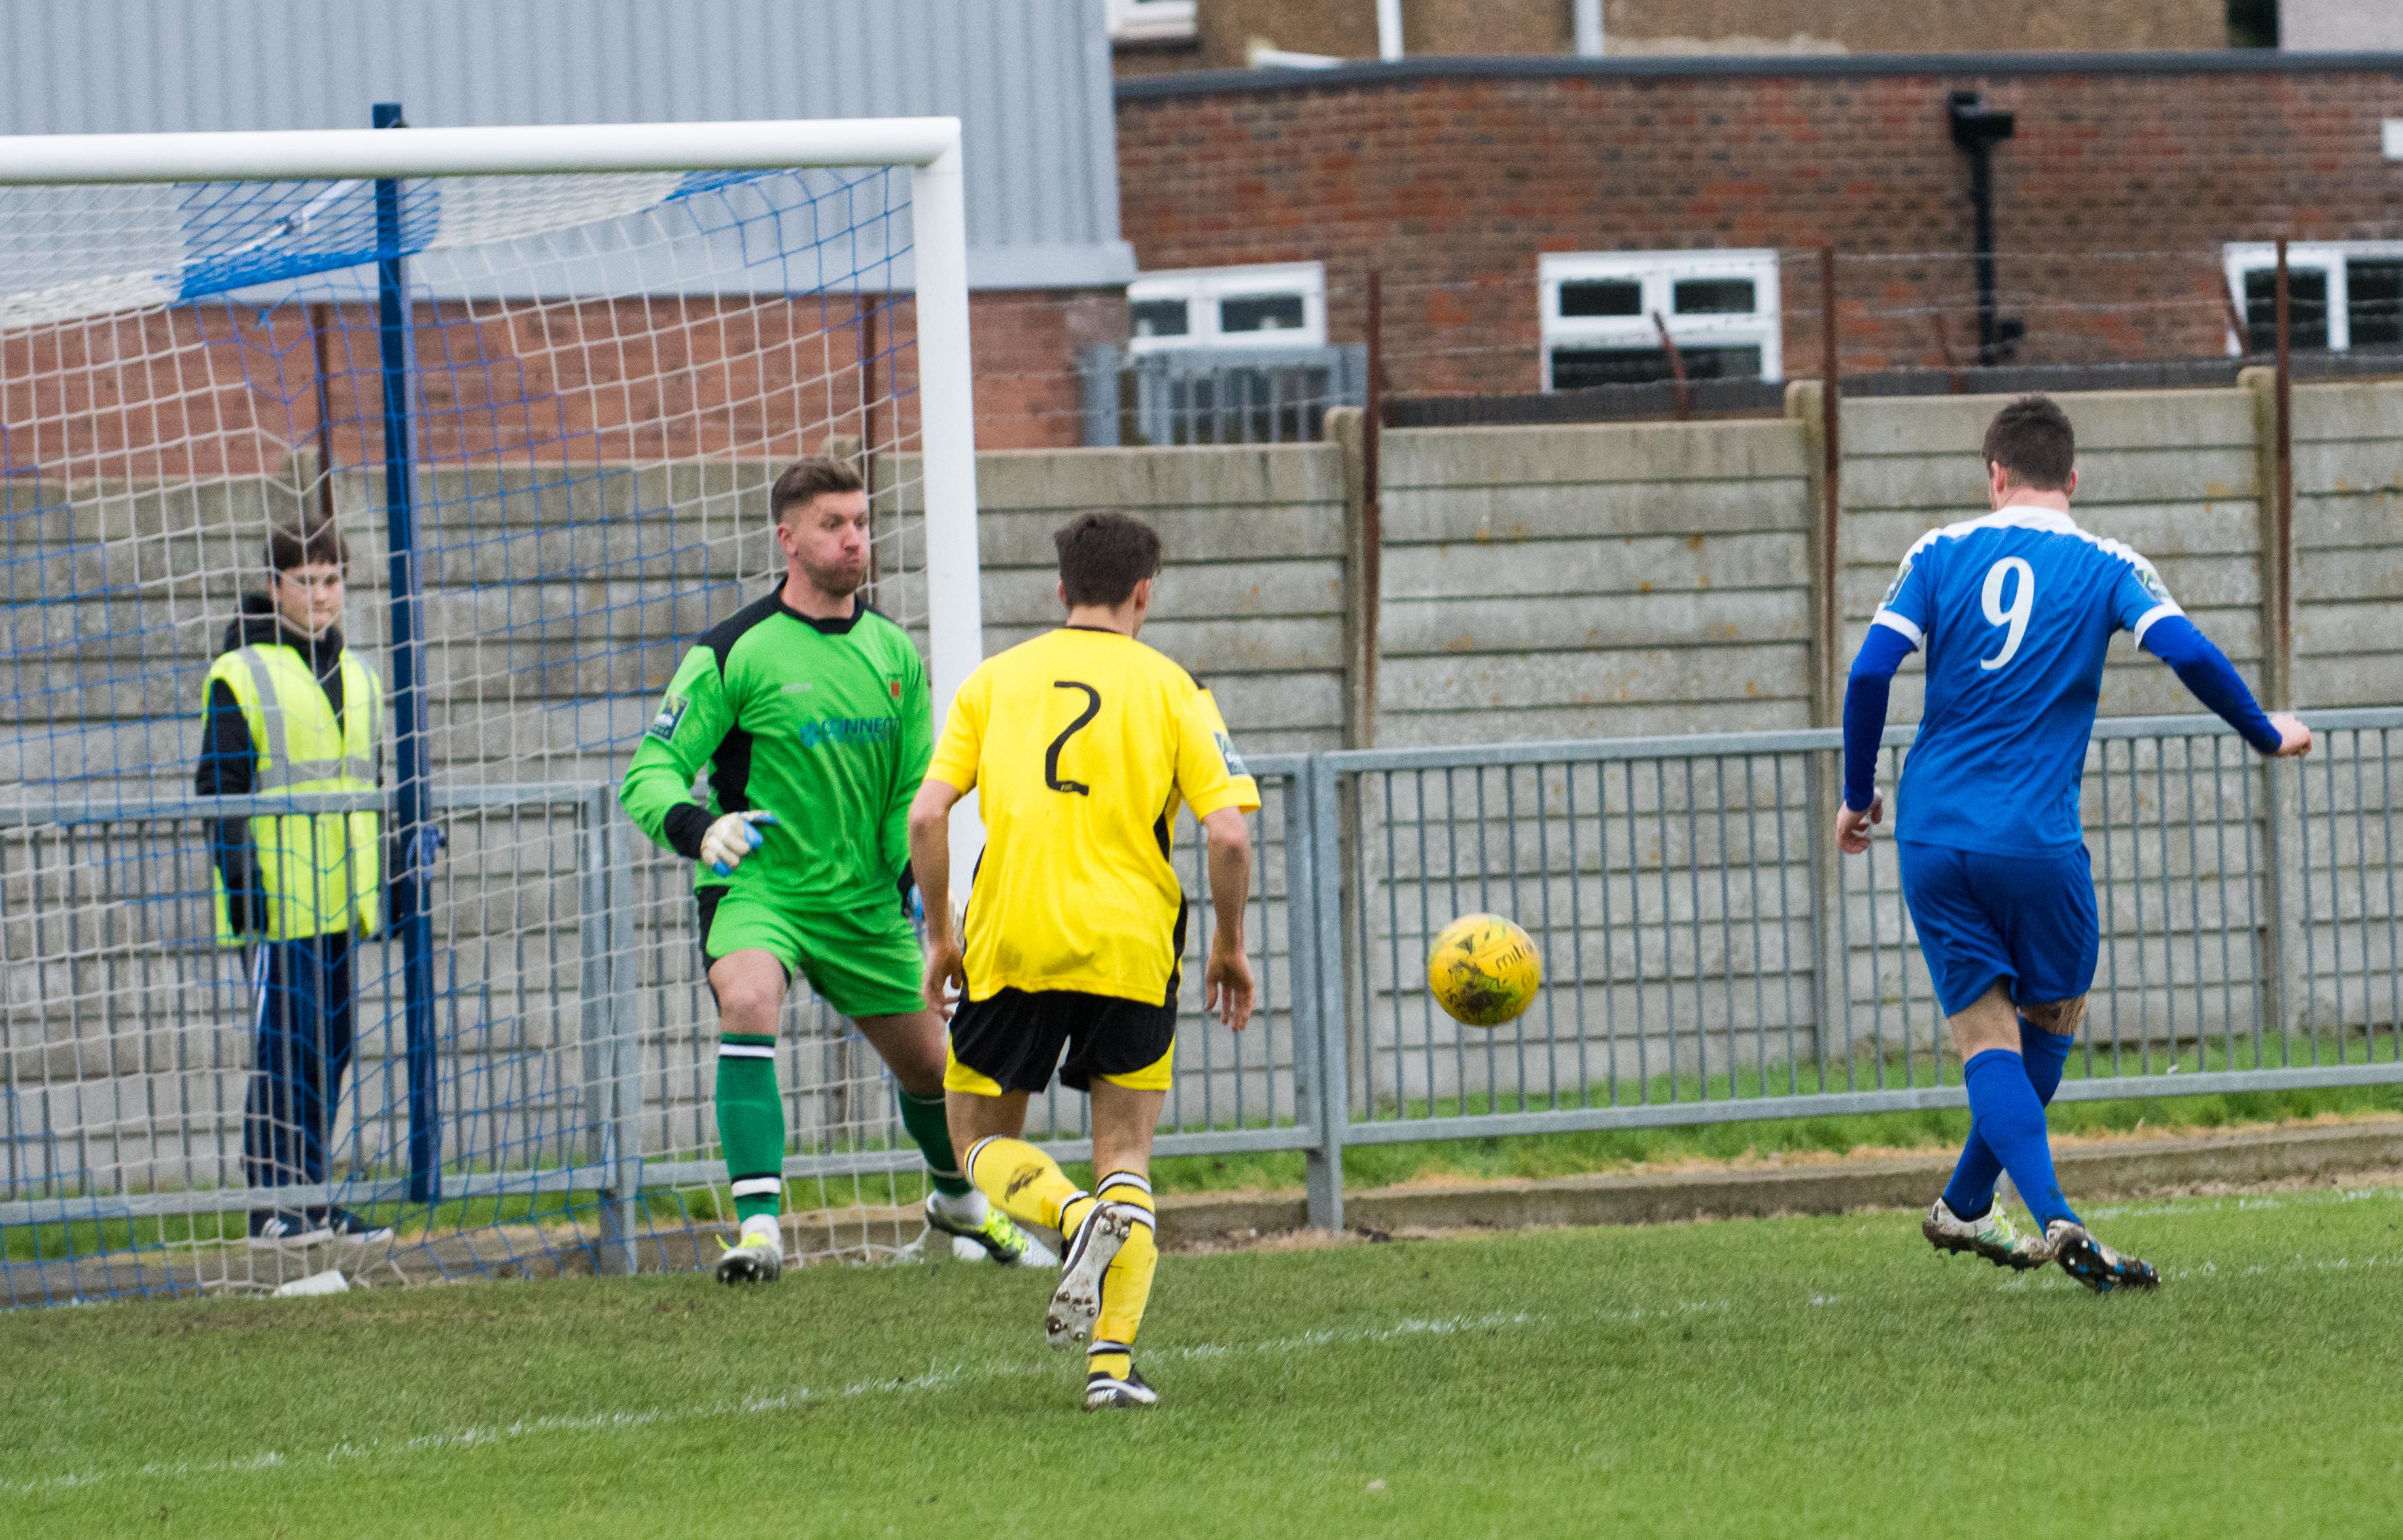 Shoreham FC vs Faversham Town 16.12.17 38